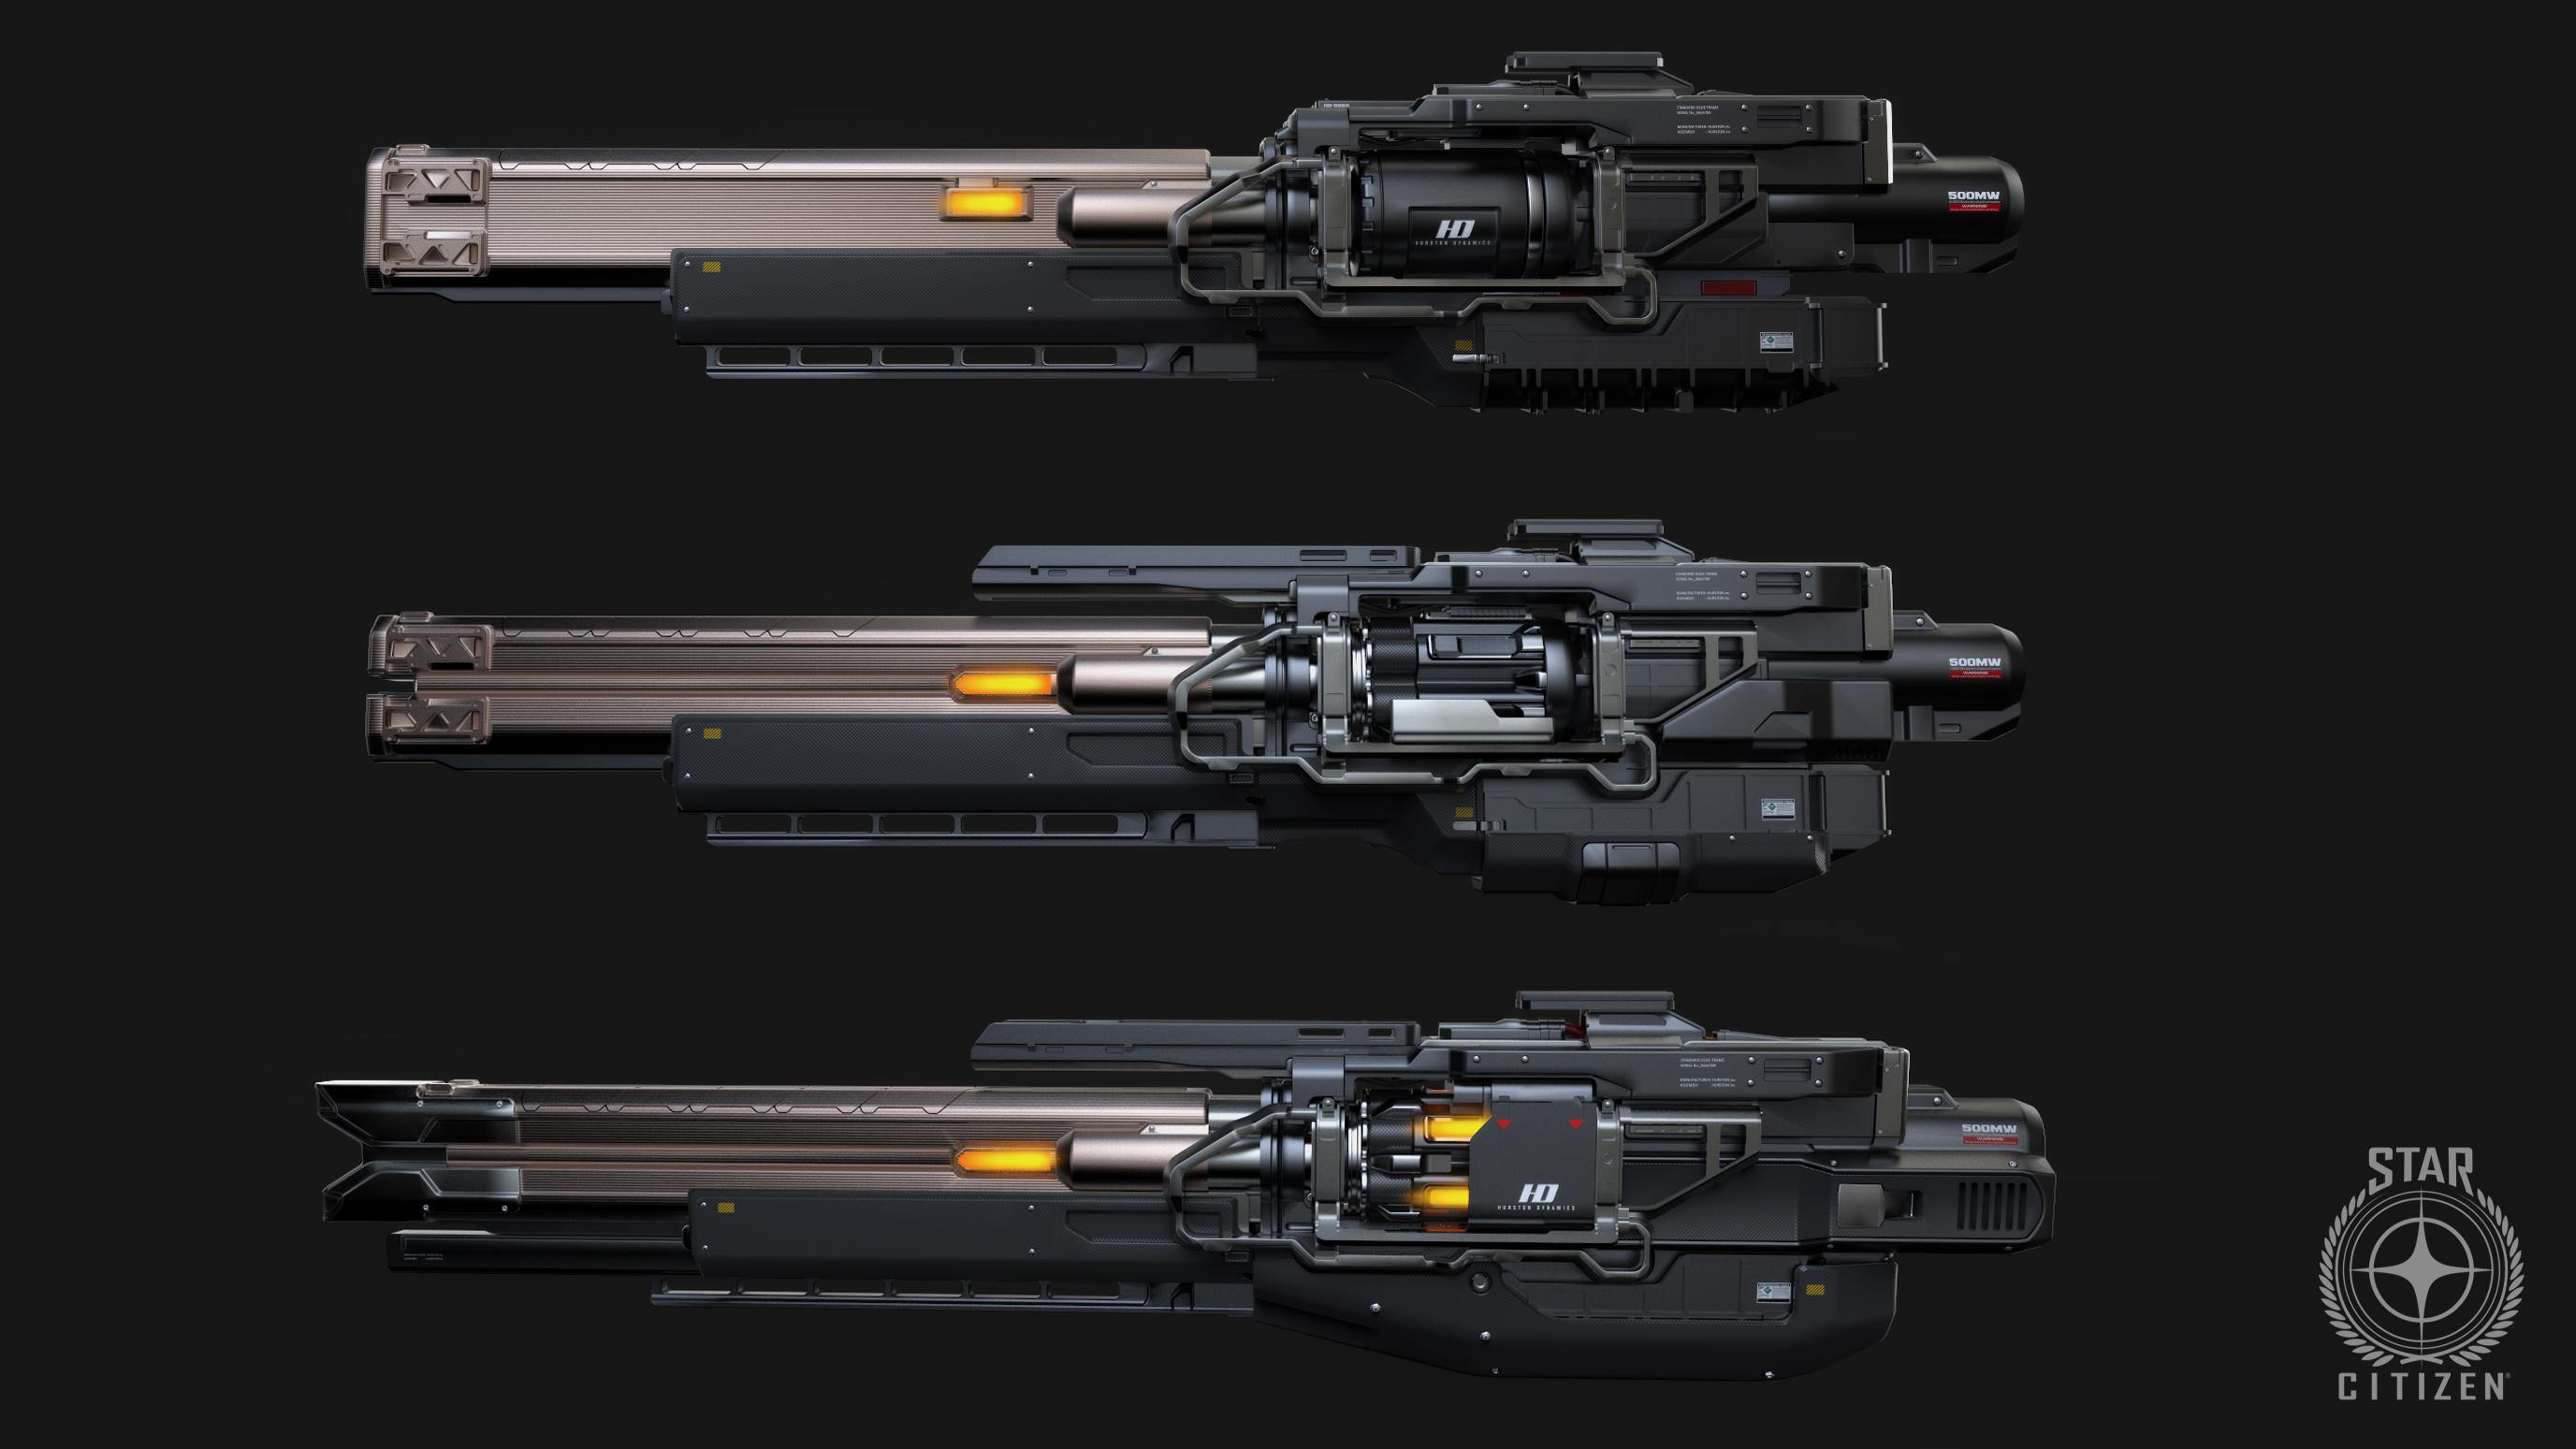 StarCitizen_SneakPeek_Weapons.png